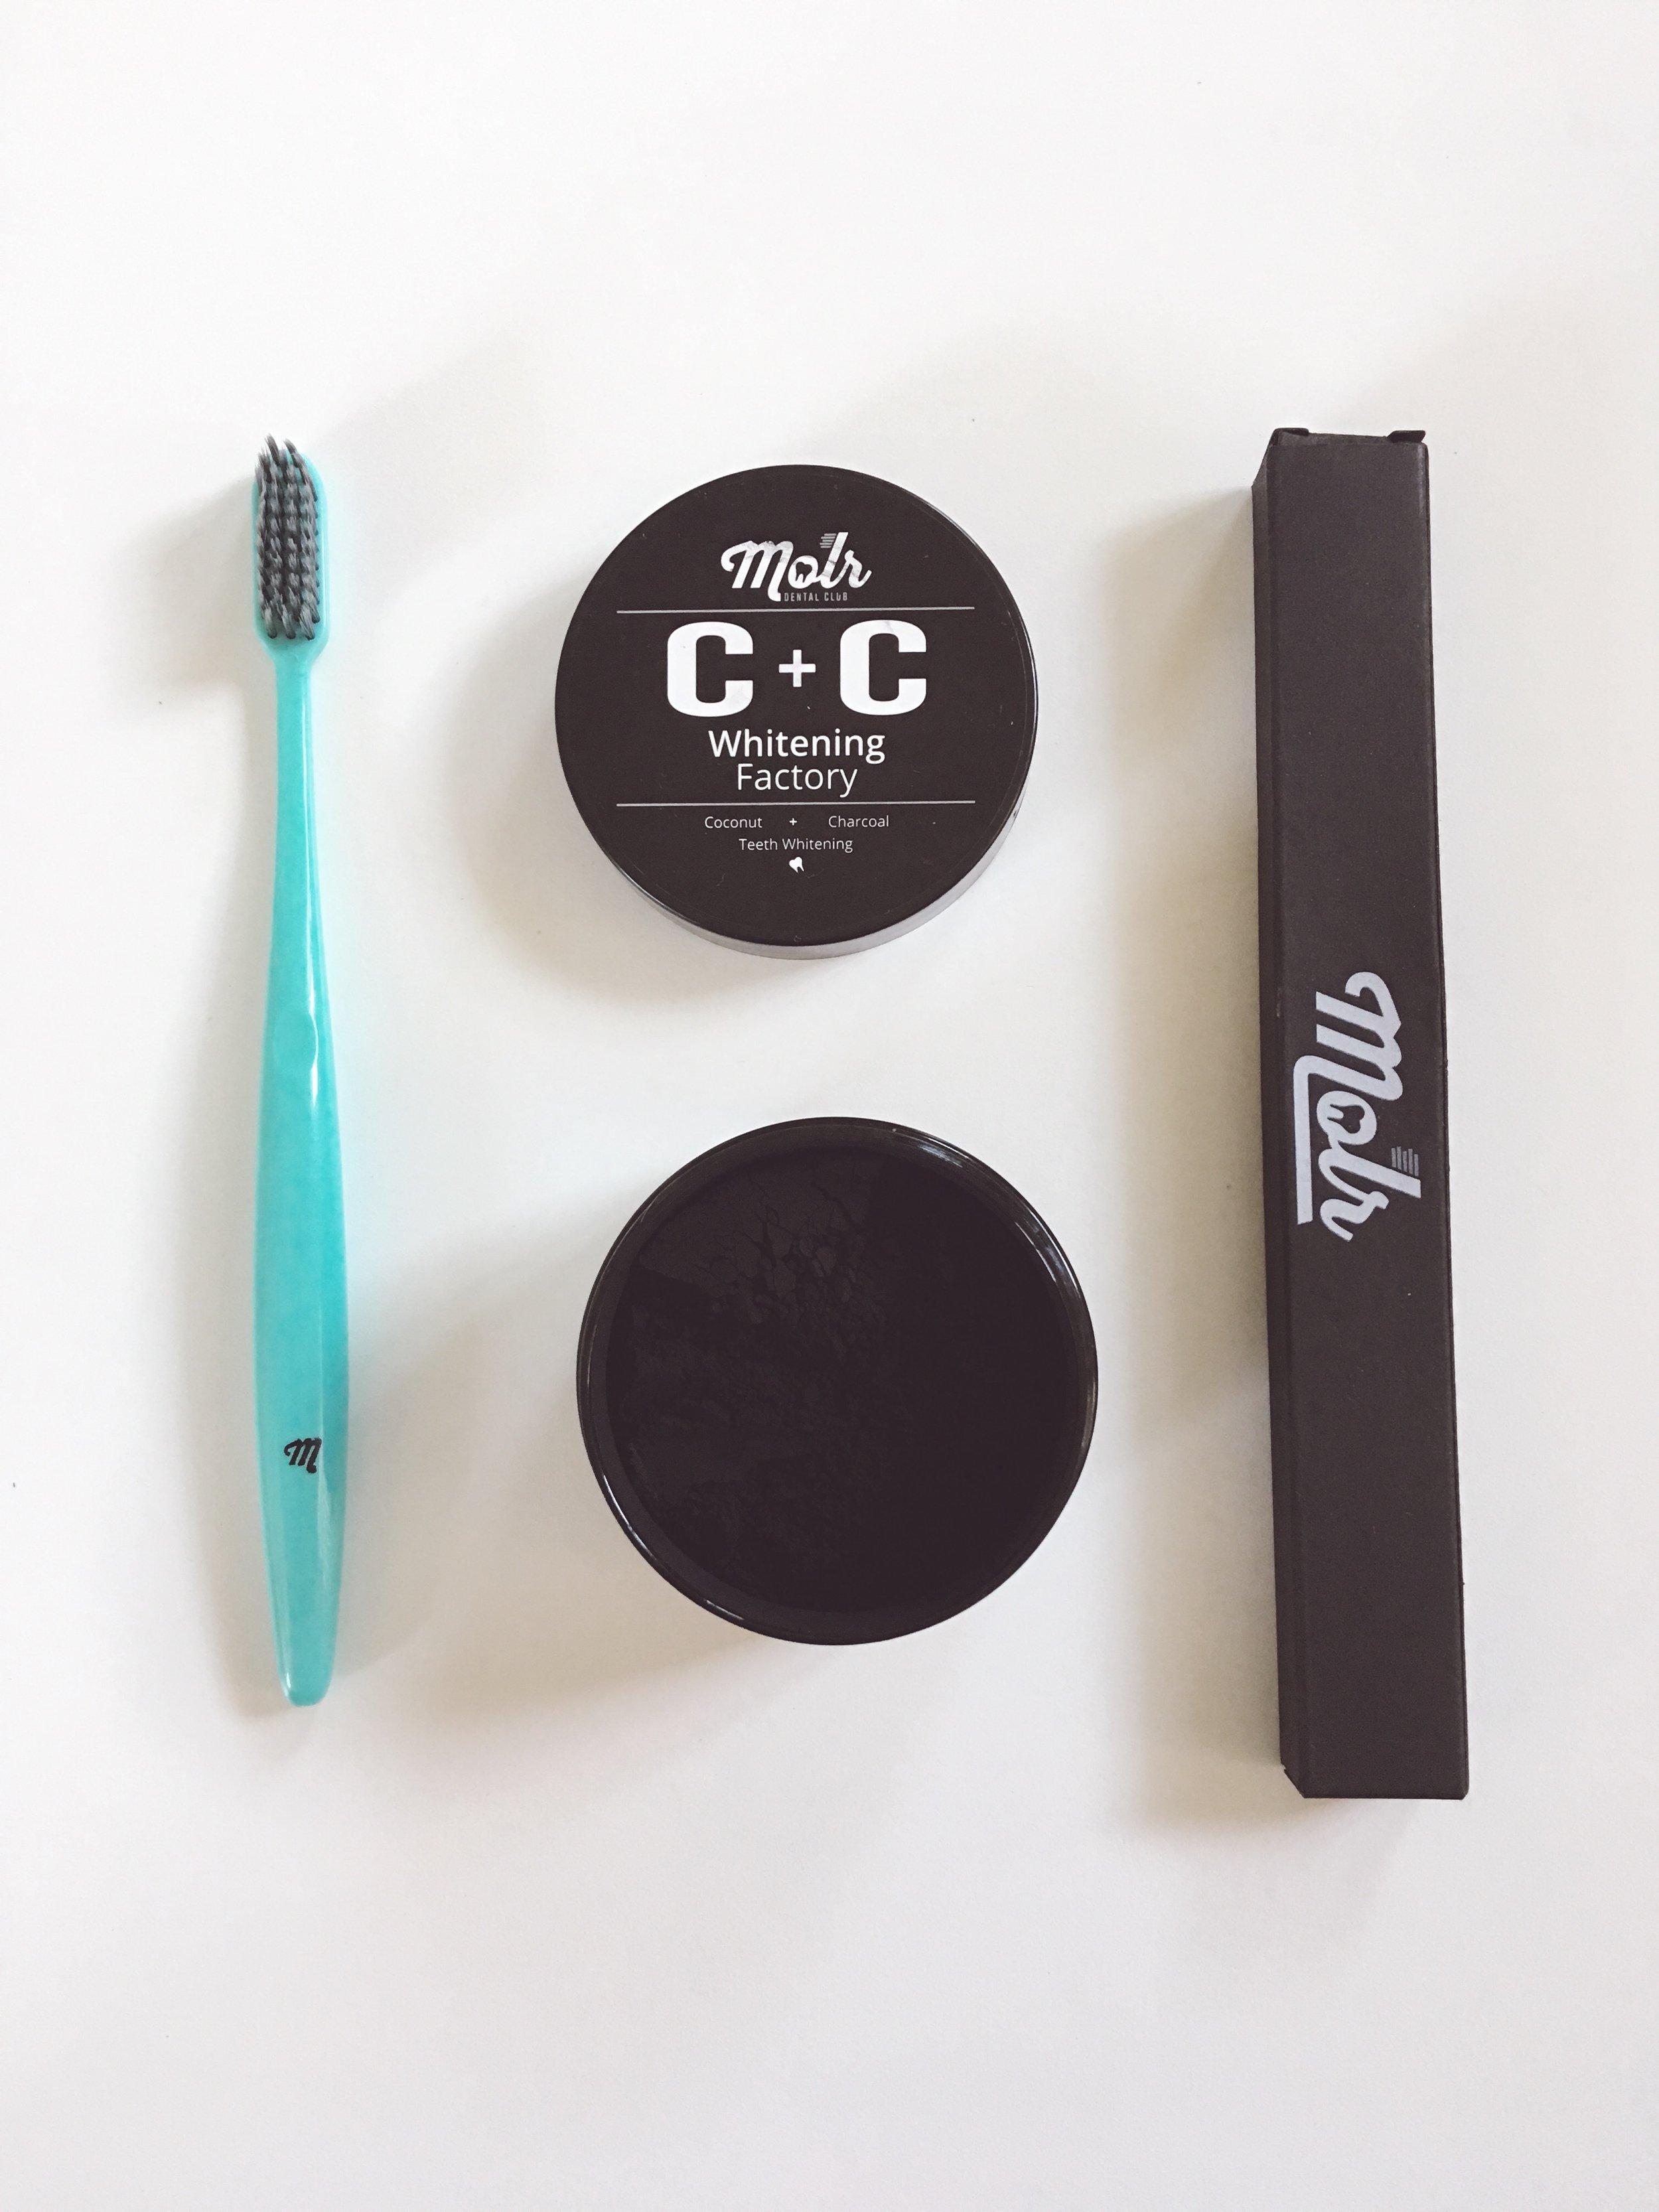 Molar Dental Club - Organic Carbon + Coconut Teeth Whitening Powder + Toothbrush